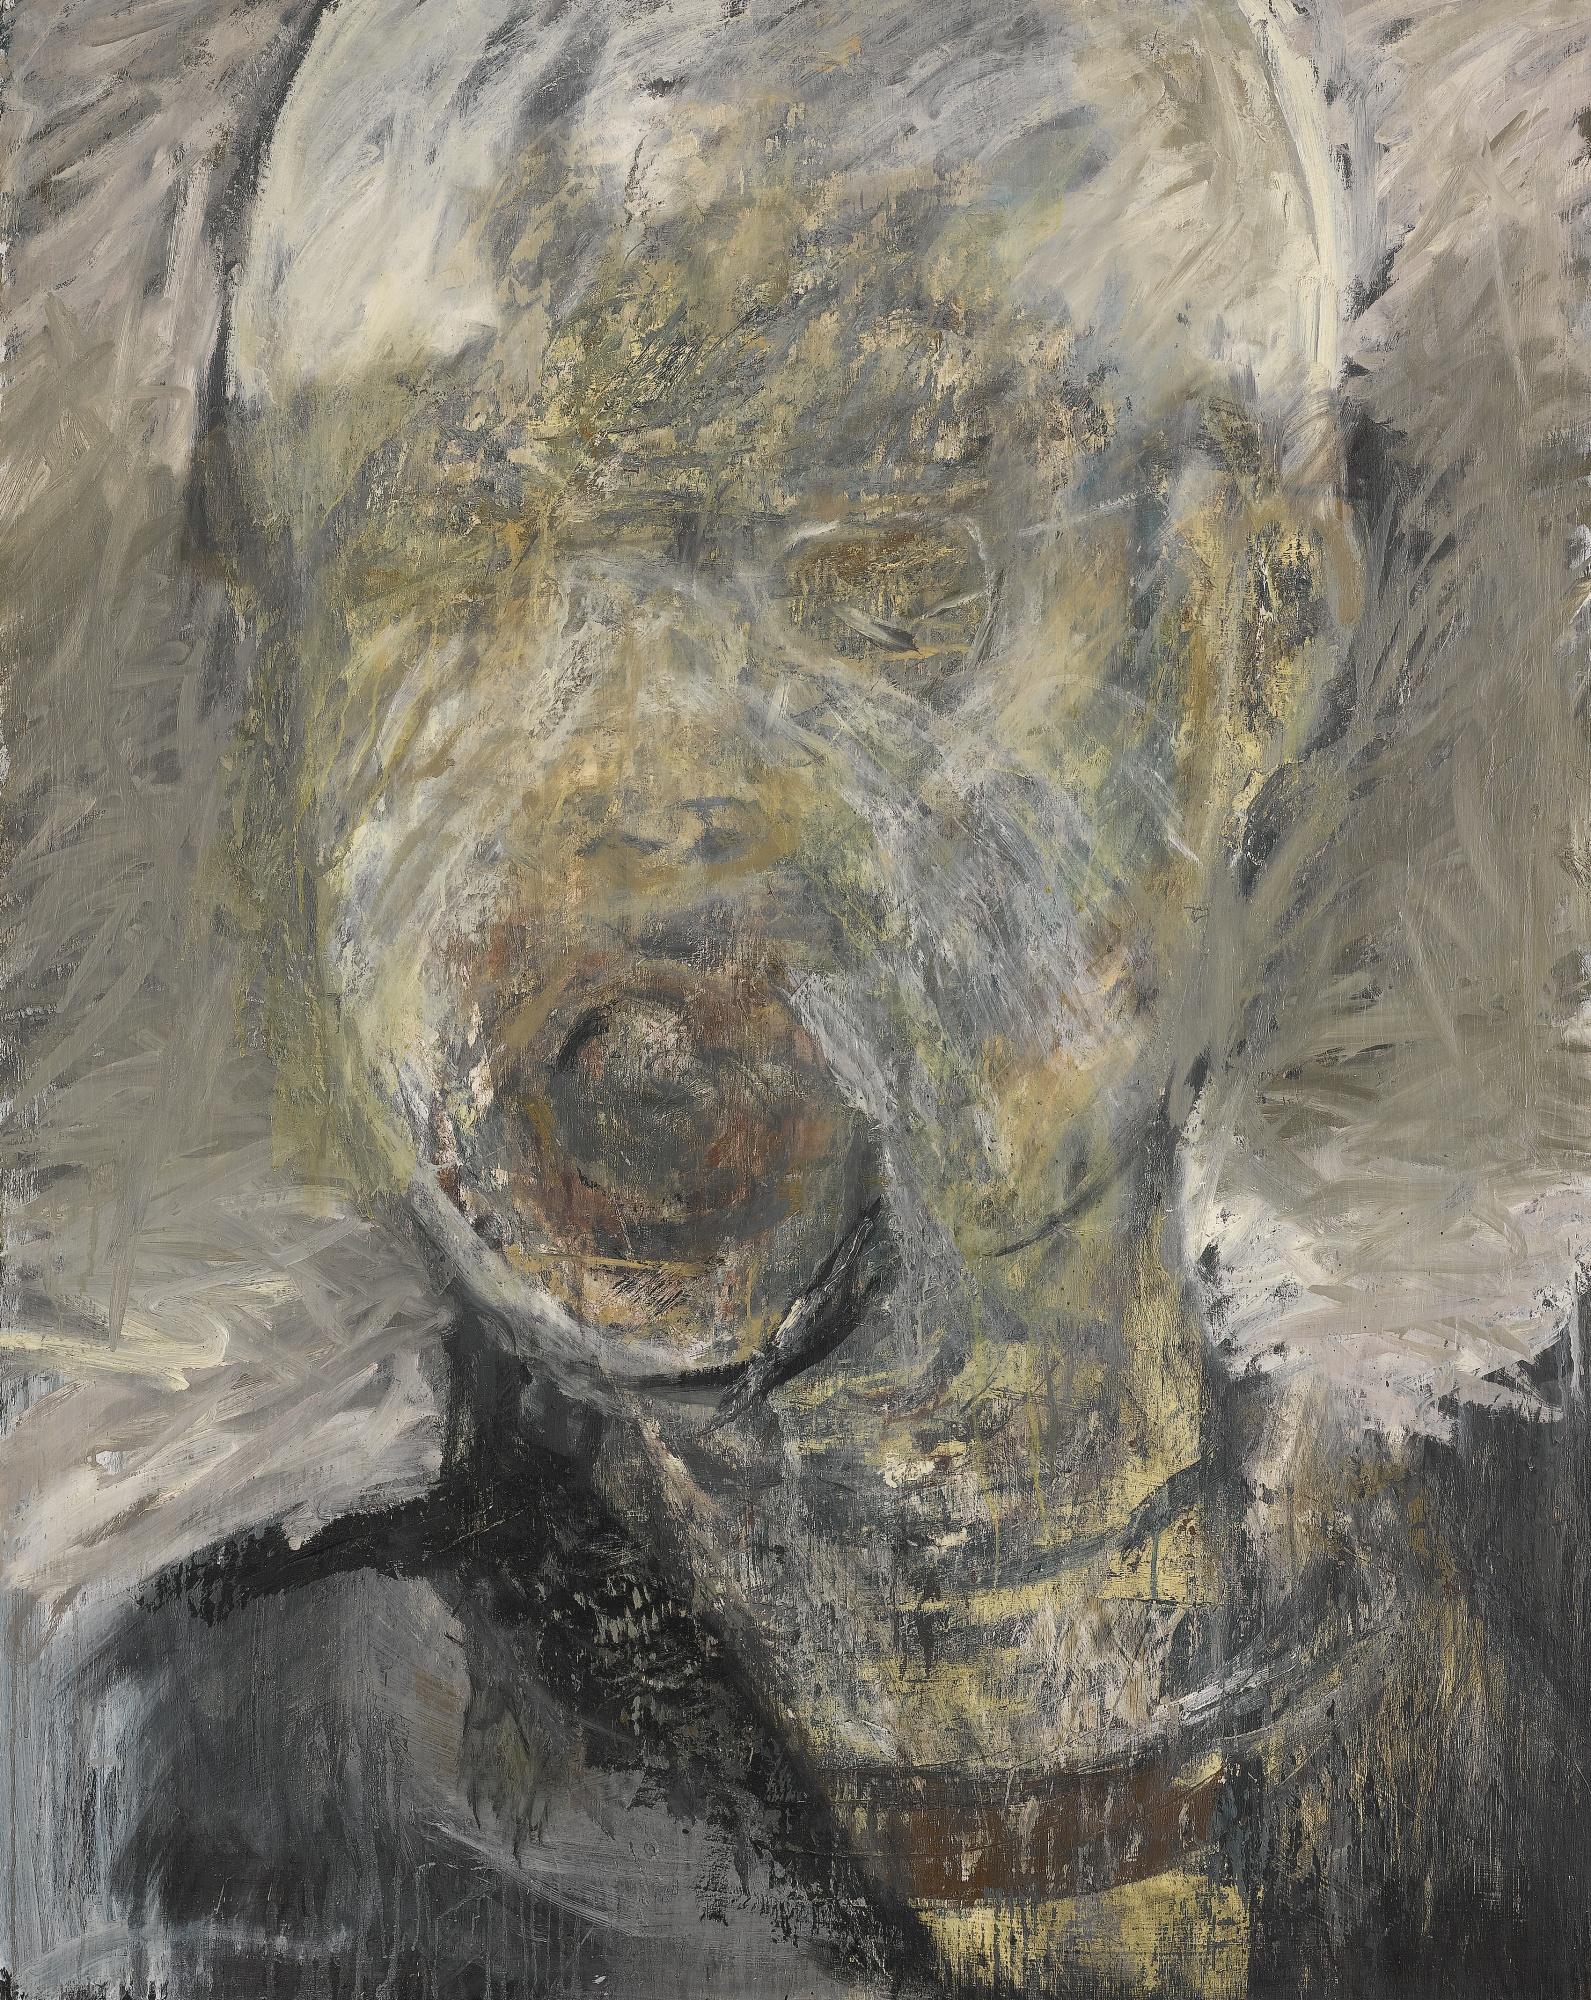 John Brown-Human Head #5-1987